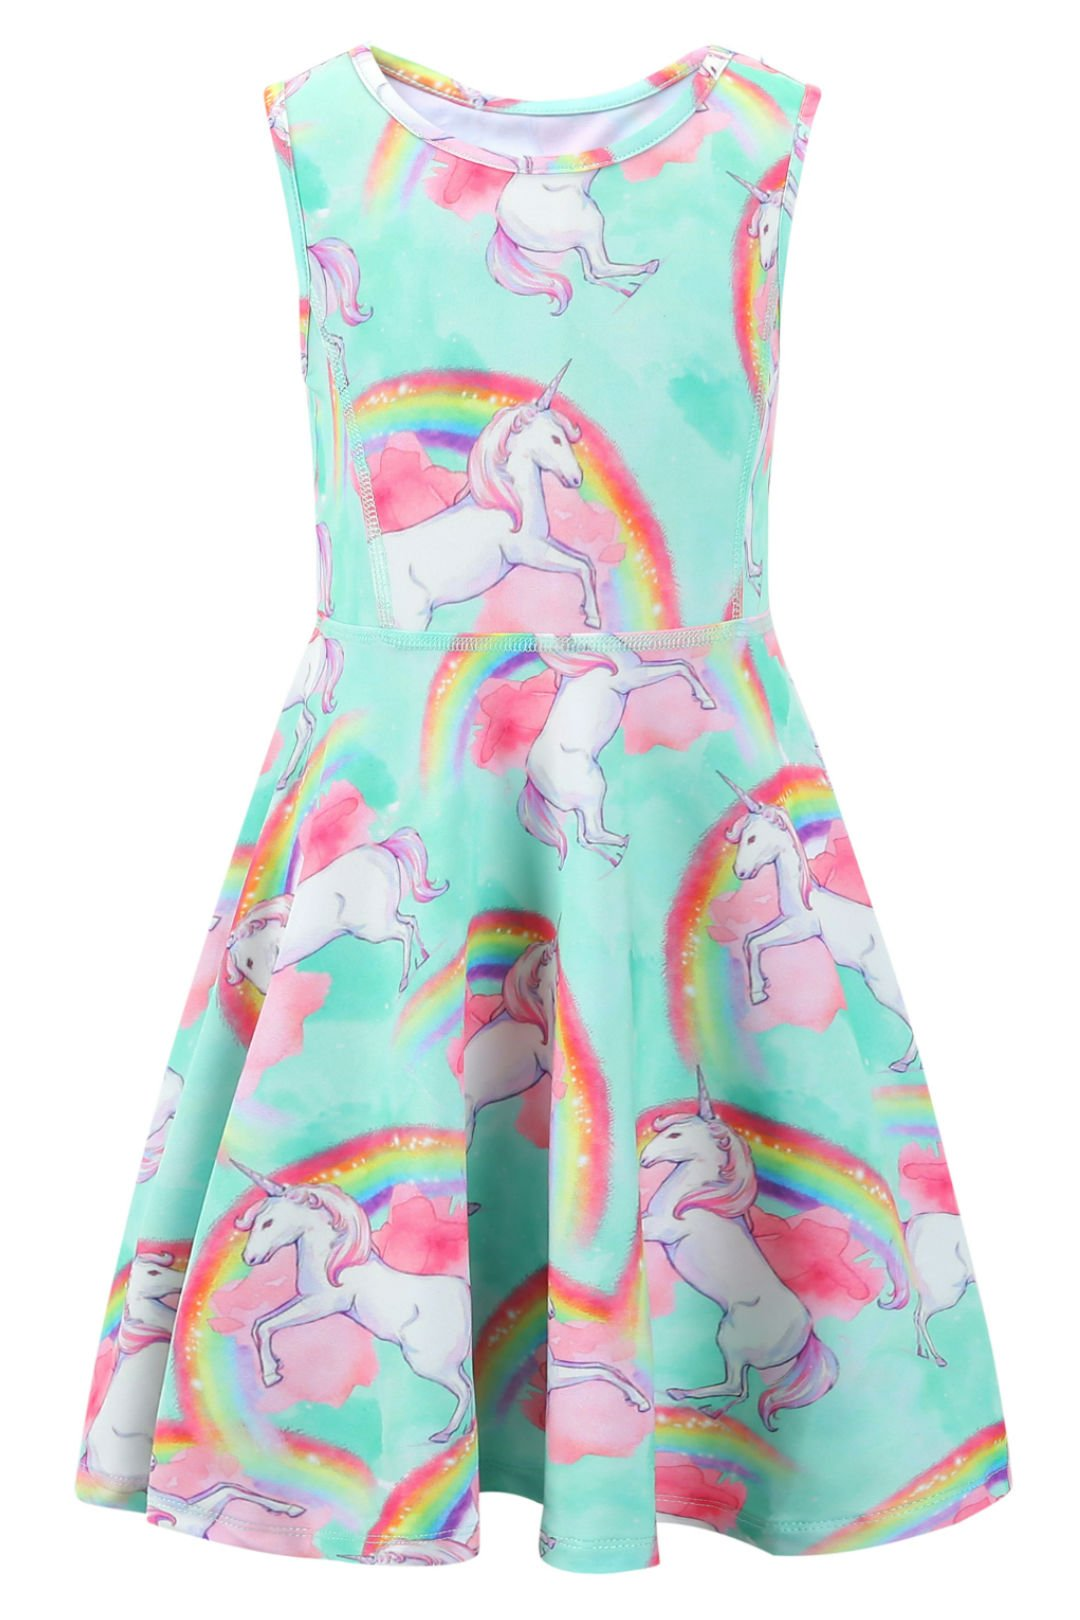 Liliane Unicorn Dress Tutu Dress for Girls Summer Dresses for Girls(A008,10-11Y)